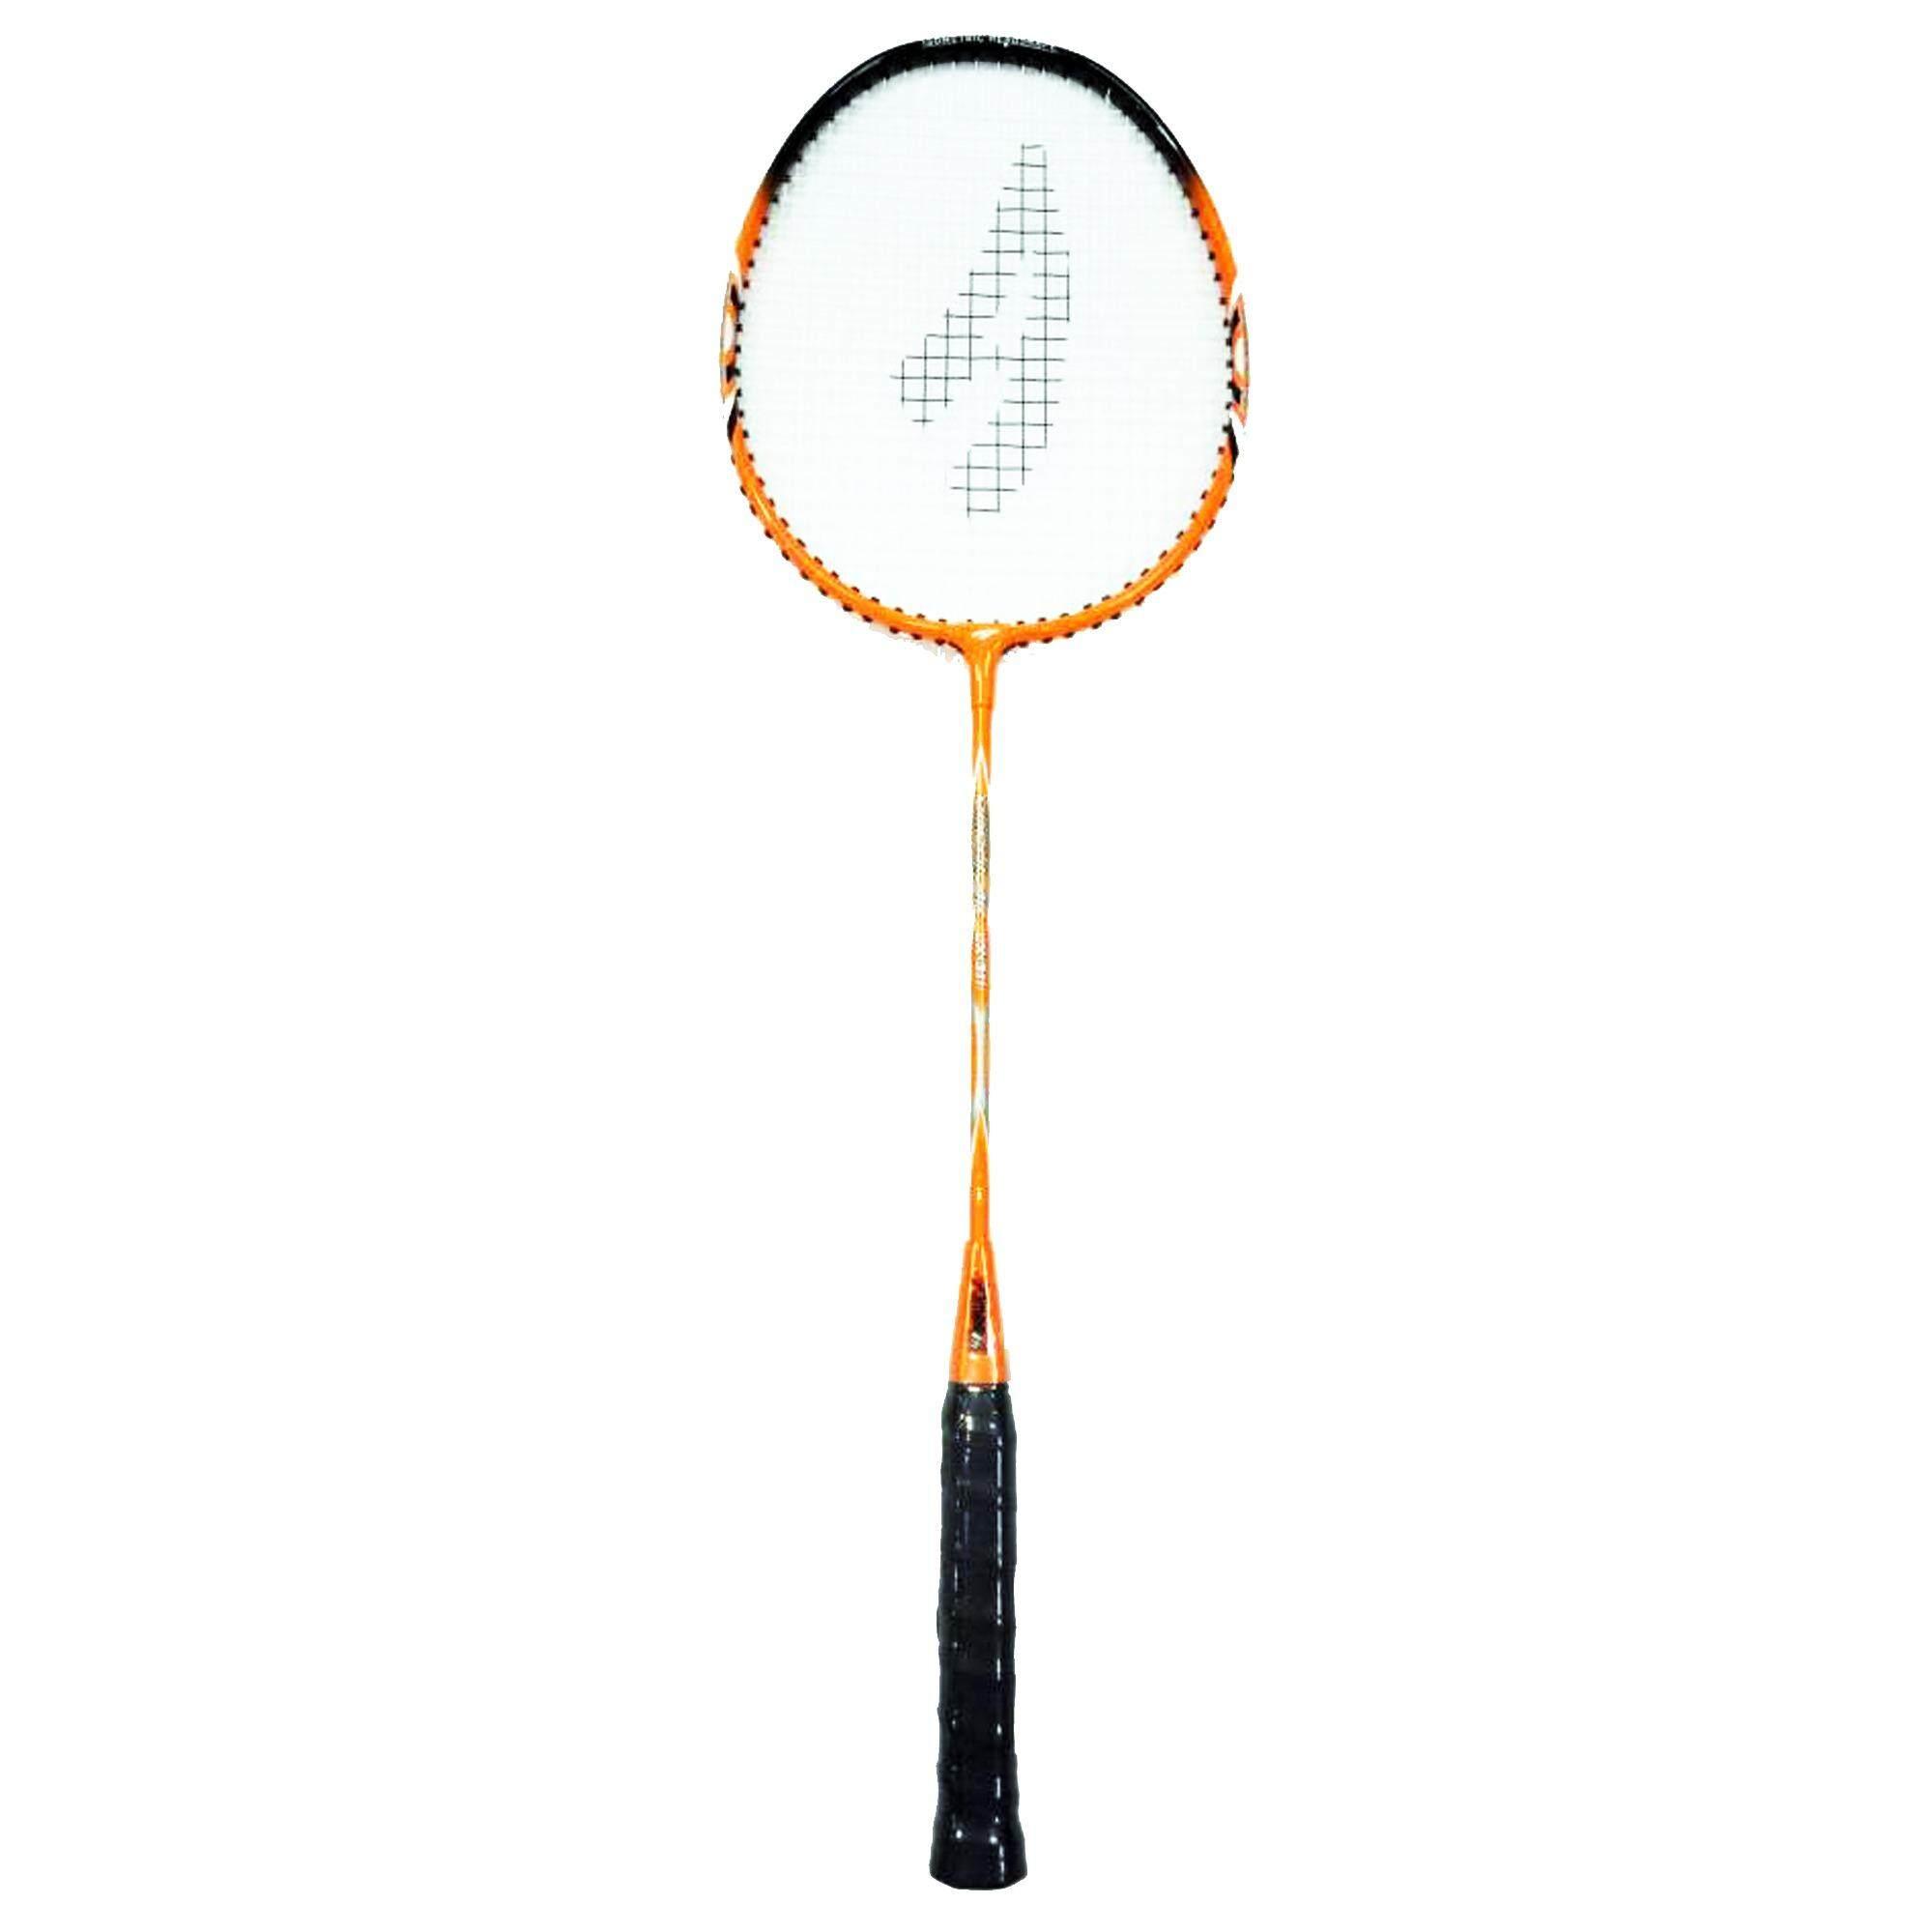 Ambros LX-311 T-Joint Badminton Racket - Orange